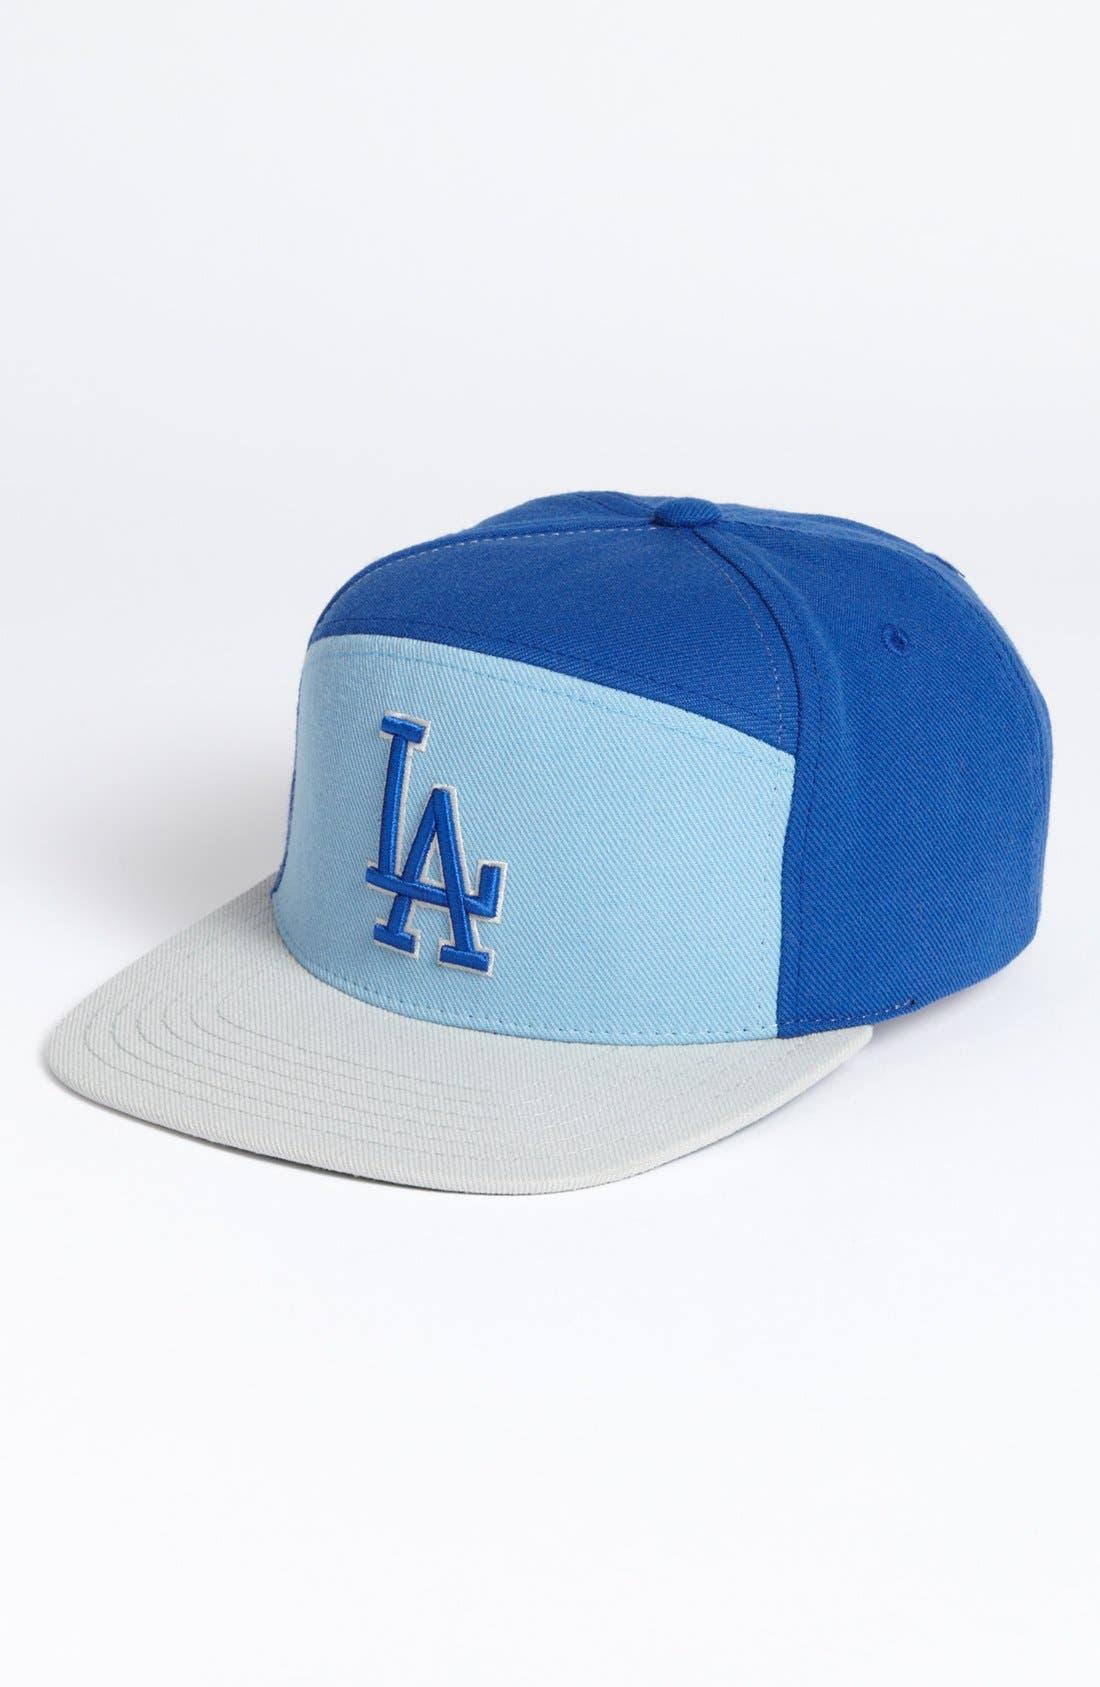 Alternate Image 1 Selected - American Needle 'Los Angeles Dodgers - Ante' Snapback Ball Cap